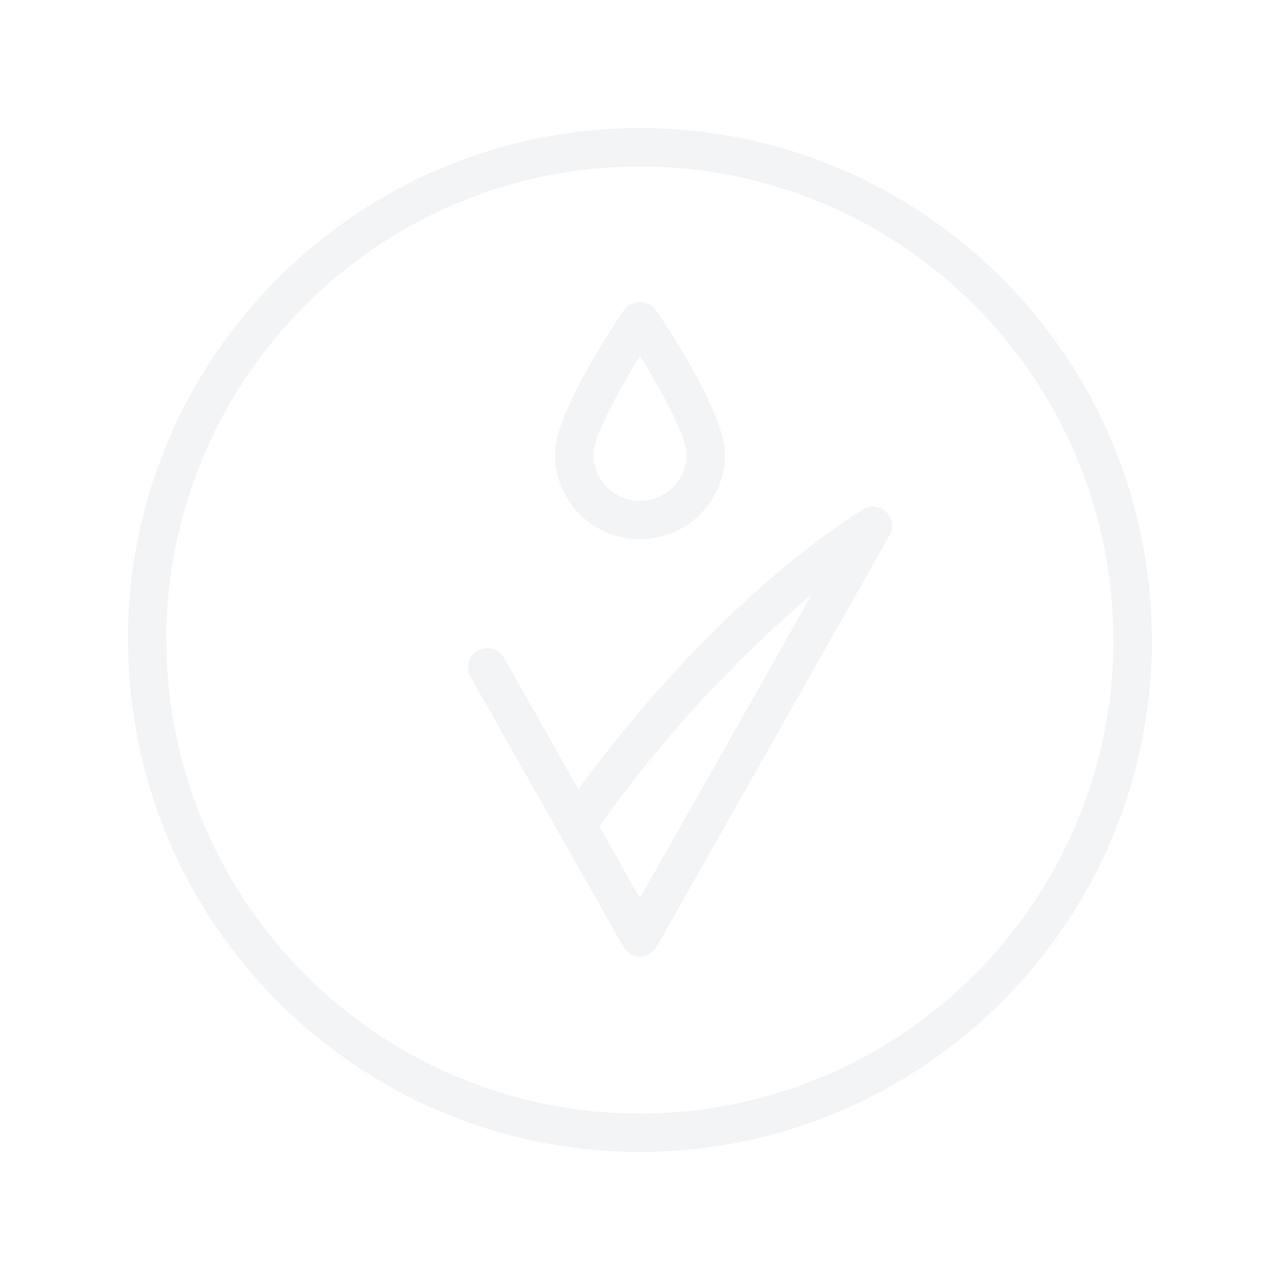 MAKEUP REVOLUTION I Love Makeup Chocolate Bronzer & Shimmer Duo 11g